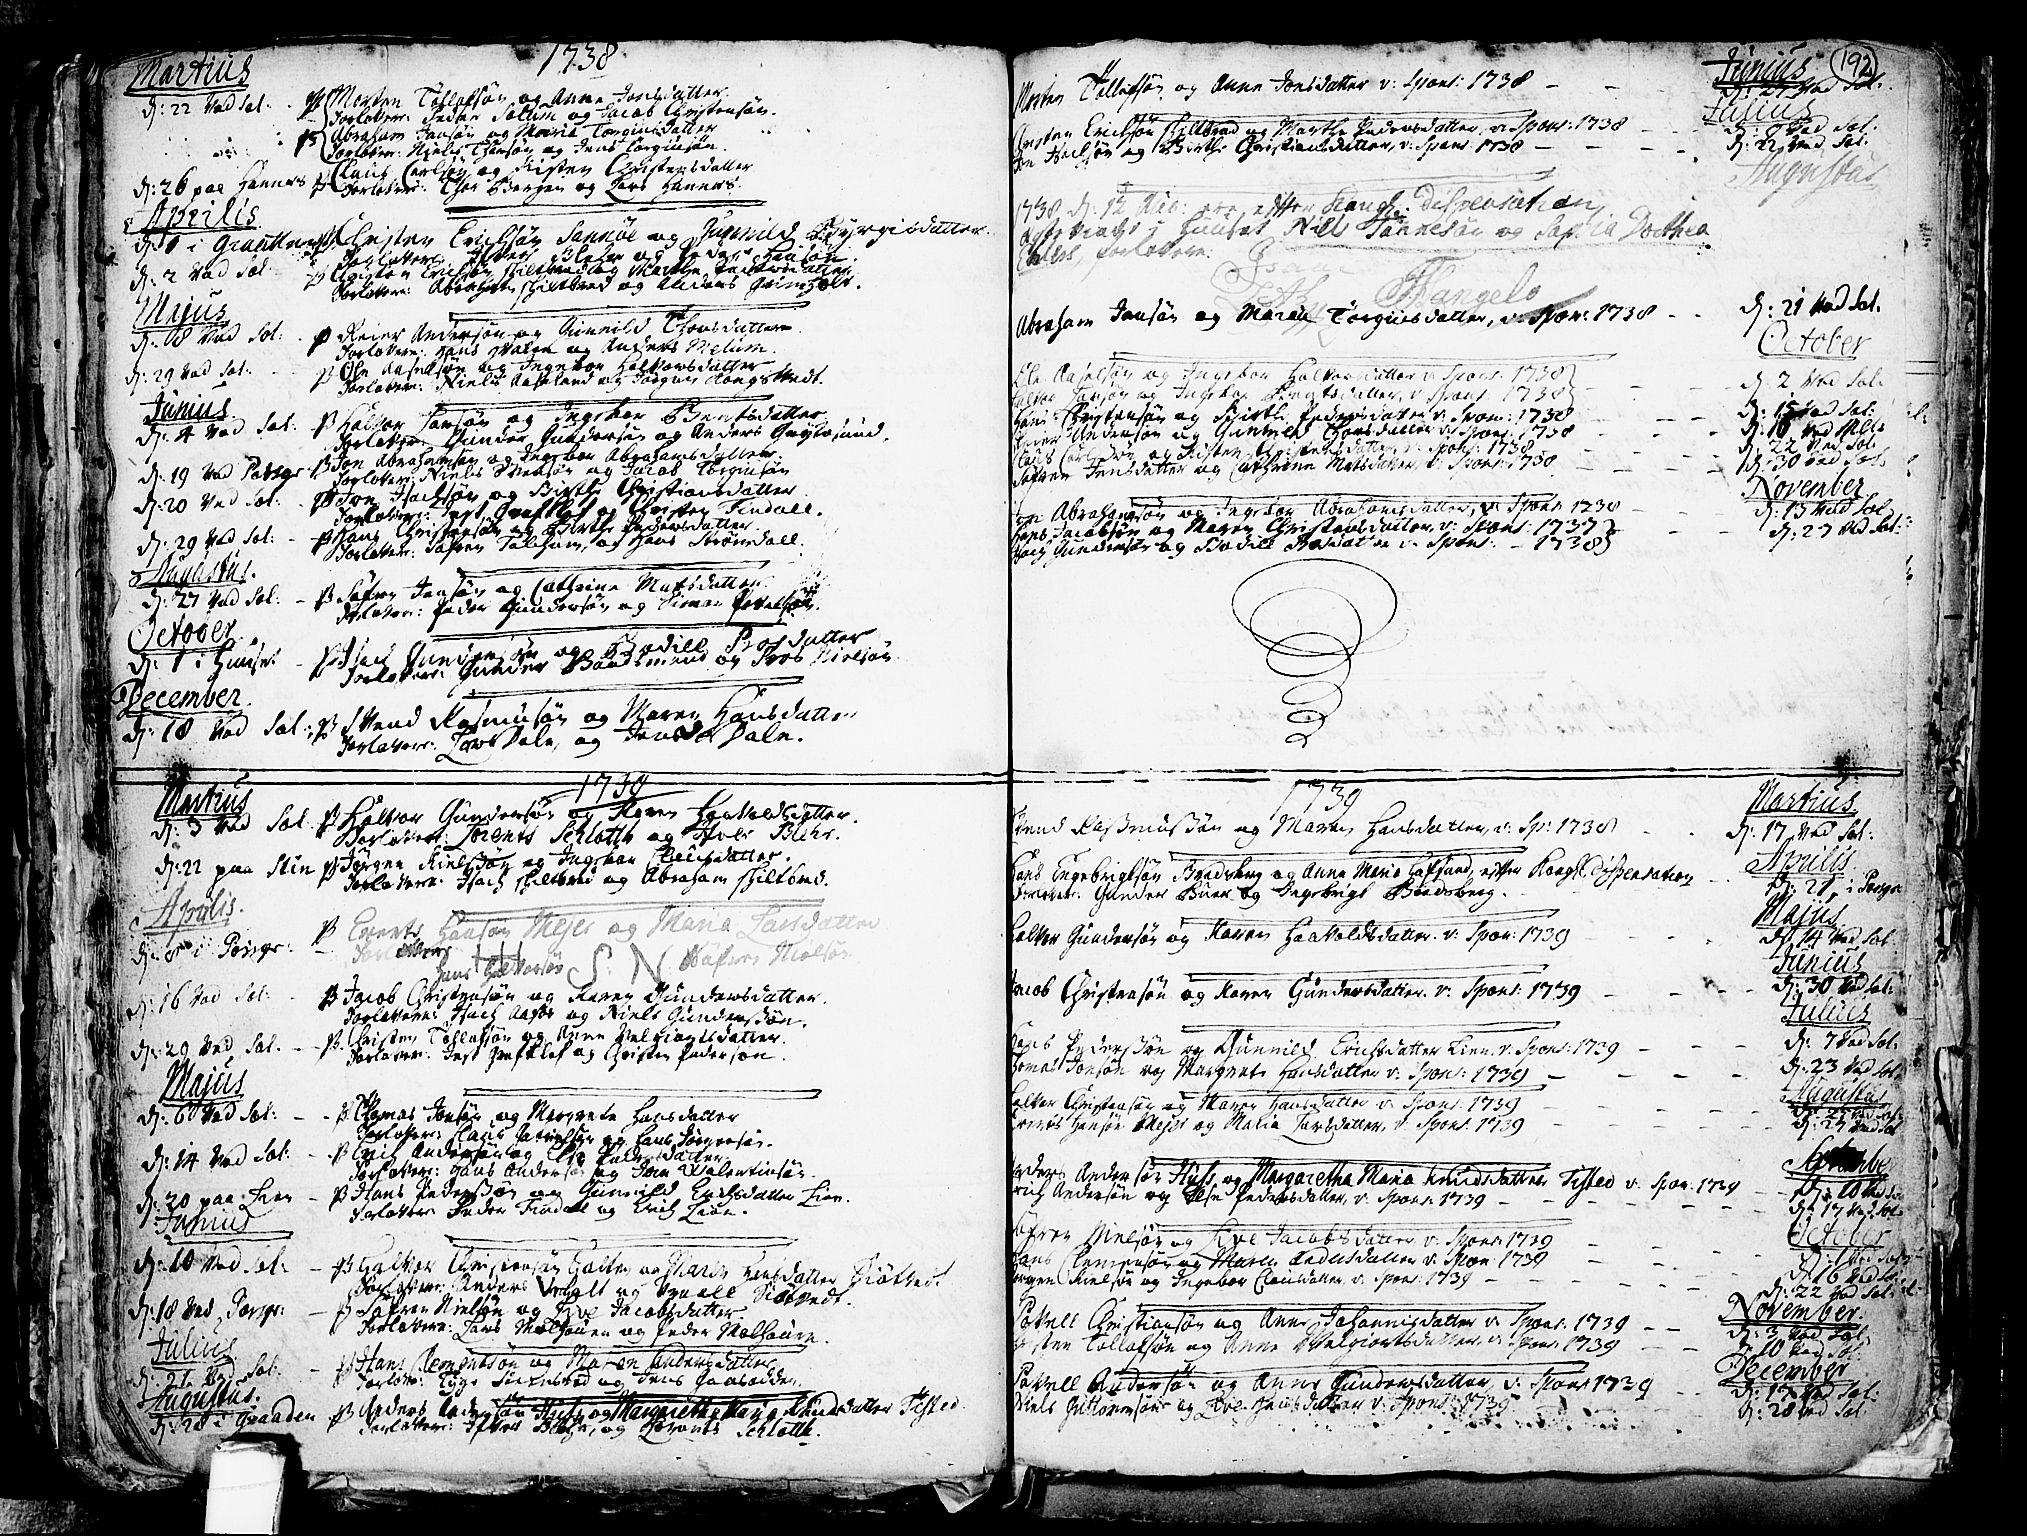 SAKO, Solum kirkebøker, F/Fa/L0002: Ministerialbok nr. I 2, 1713-1761, s. 192